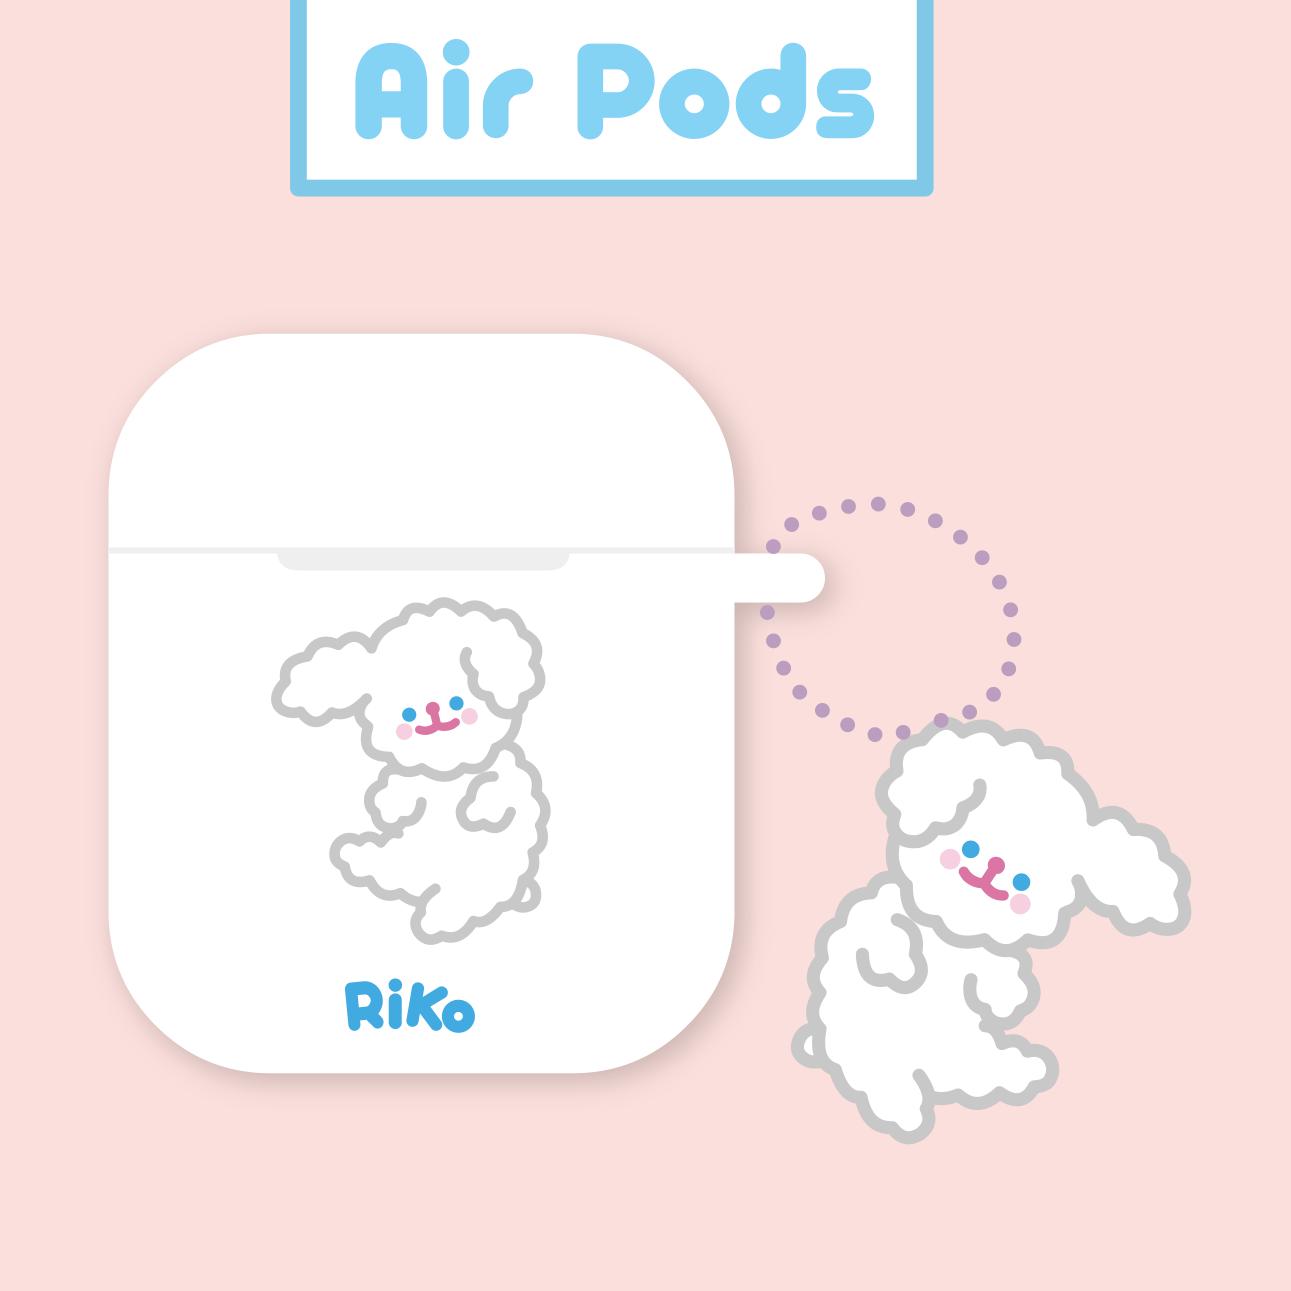 funnyns白色小狗狗airpodspro3保护套tpu苹果1/2无线蓝牙耳机软套